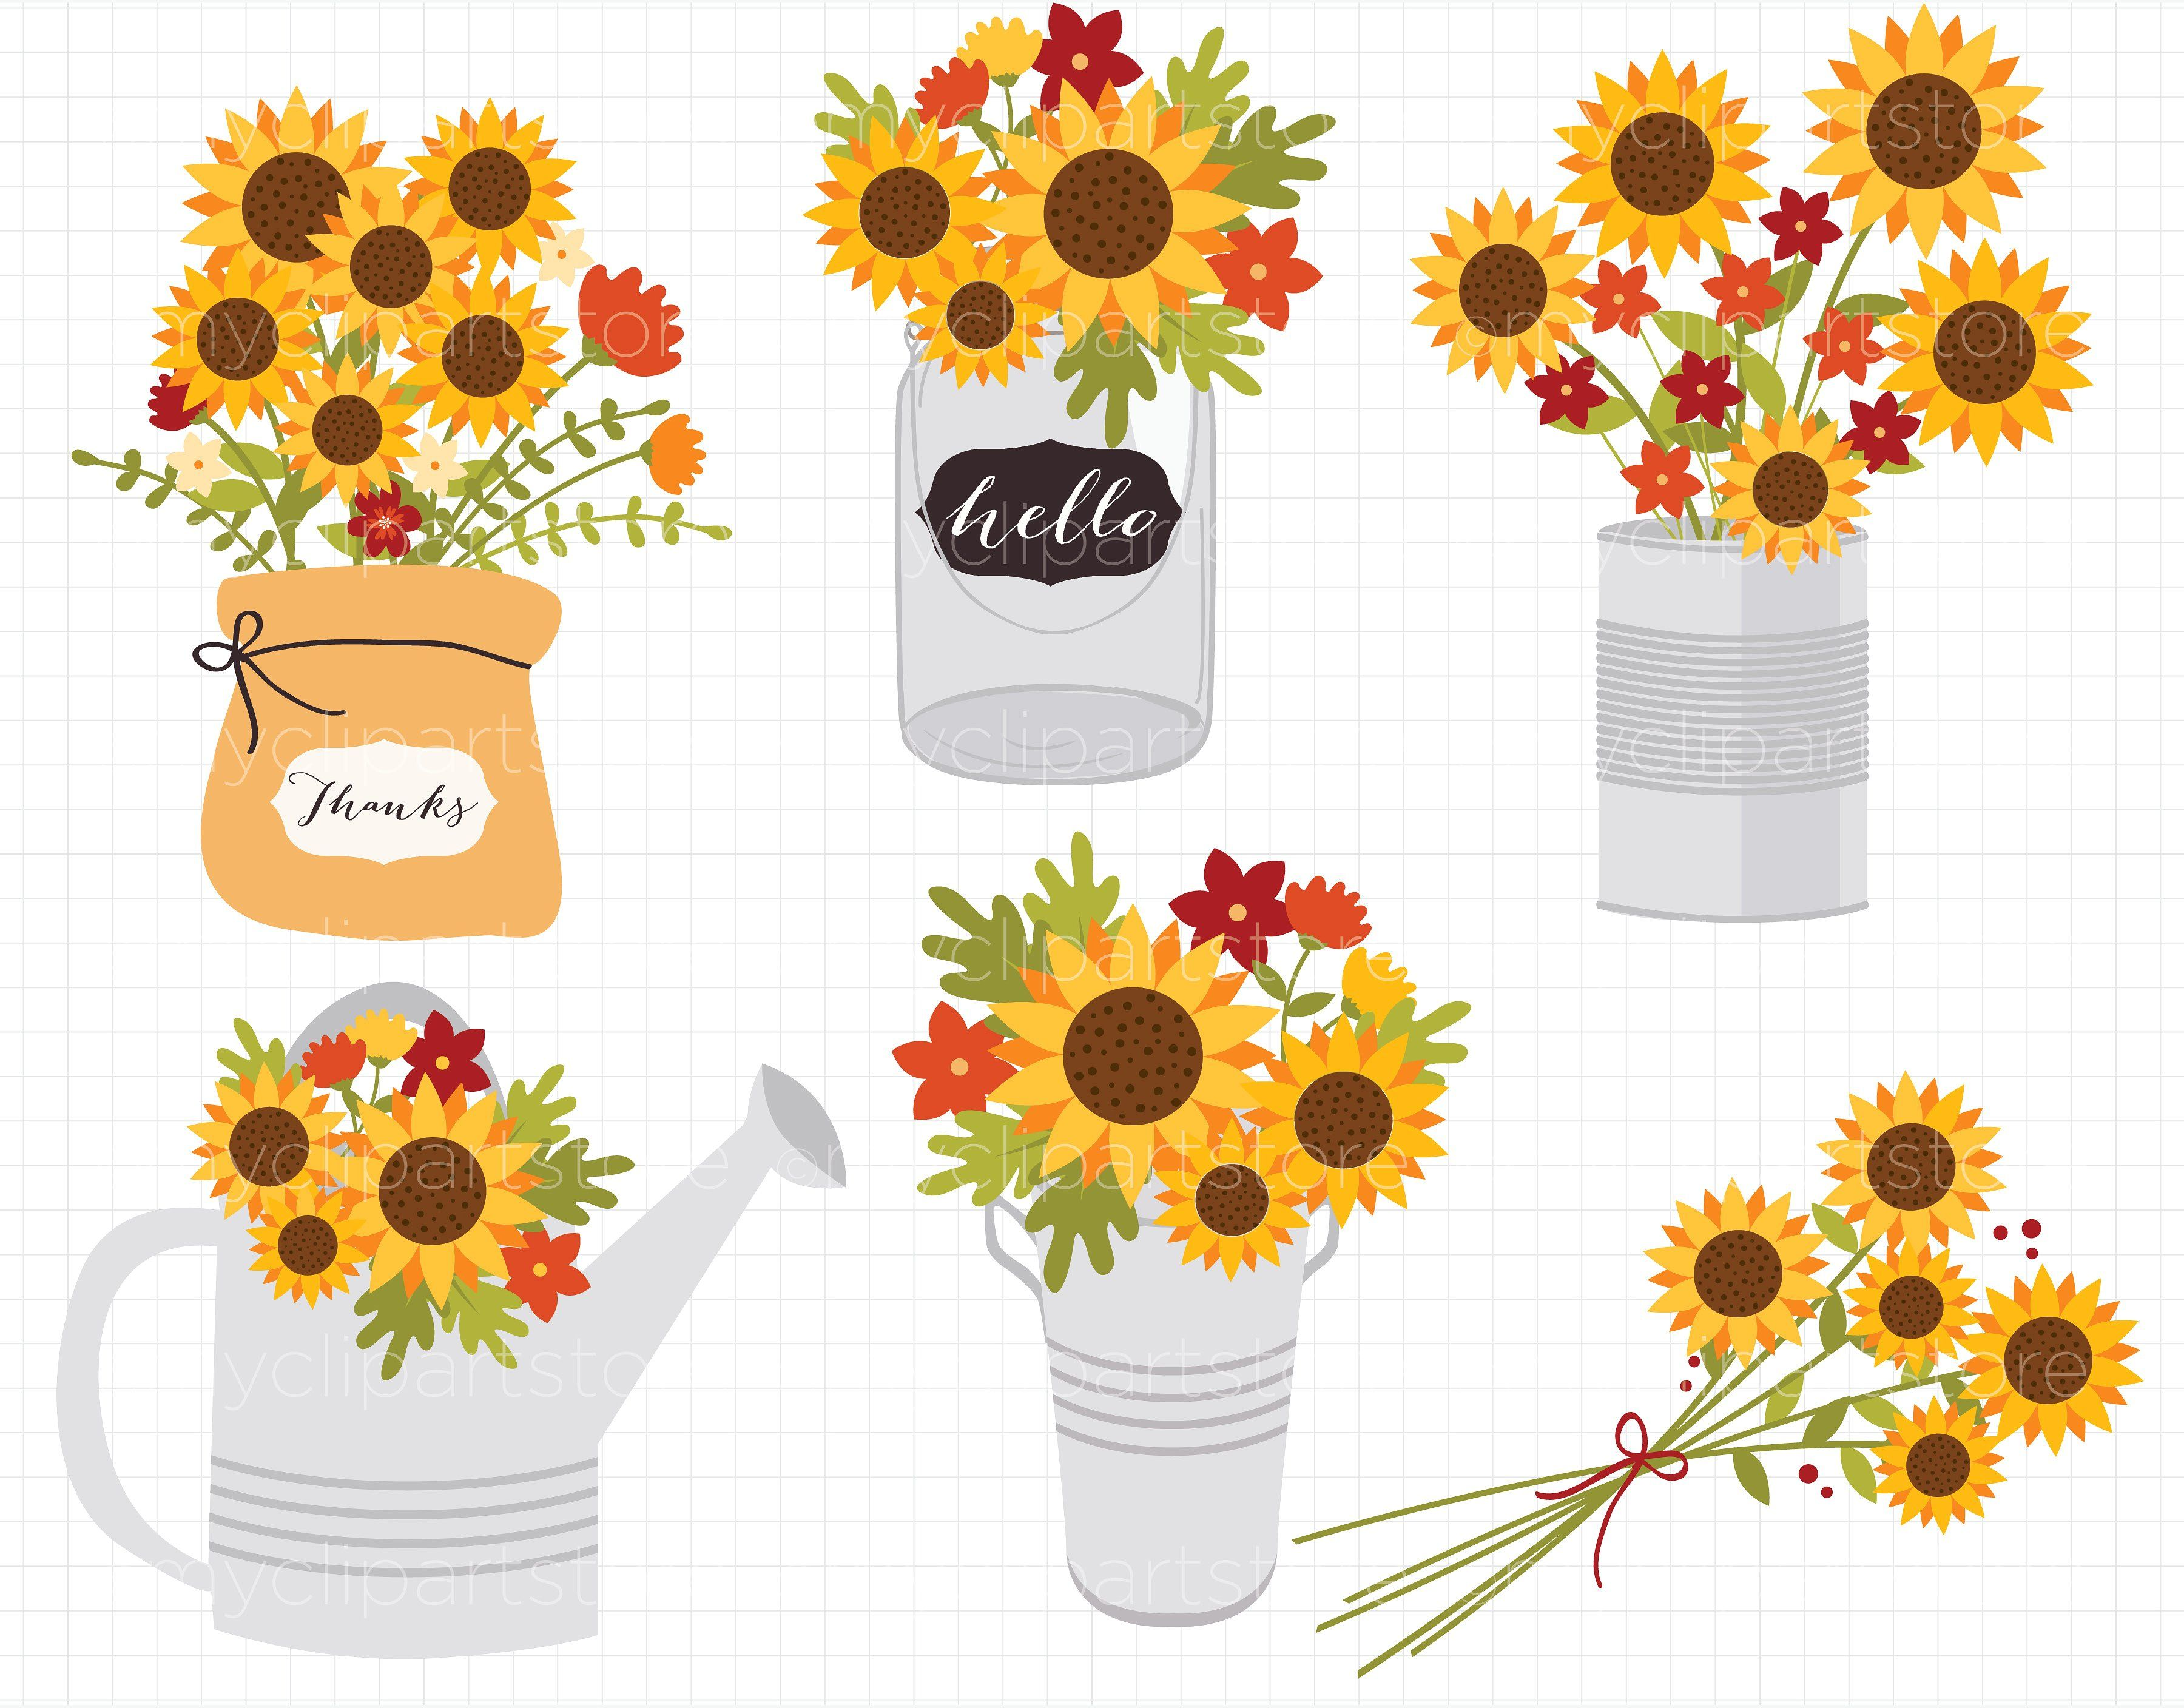 Sunflowers, Fall Flowers Clipart #AUTUMN#THANKSGIVING.